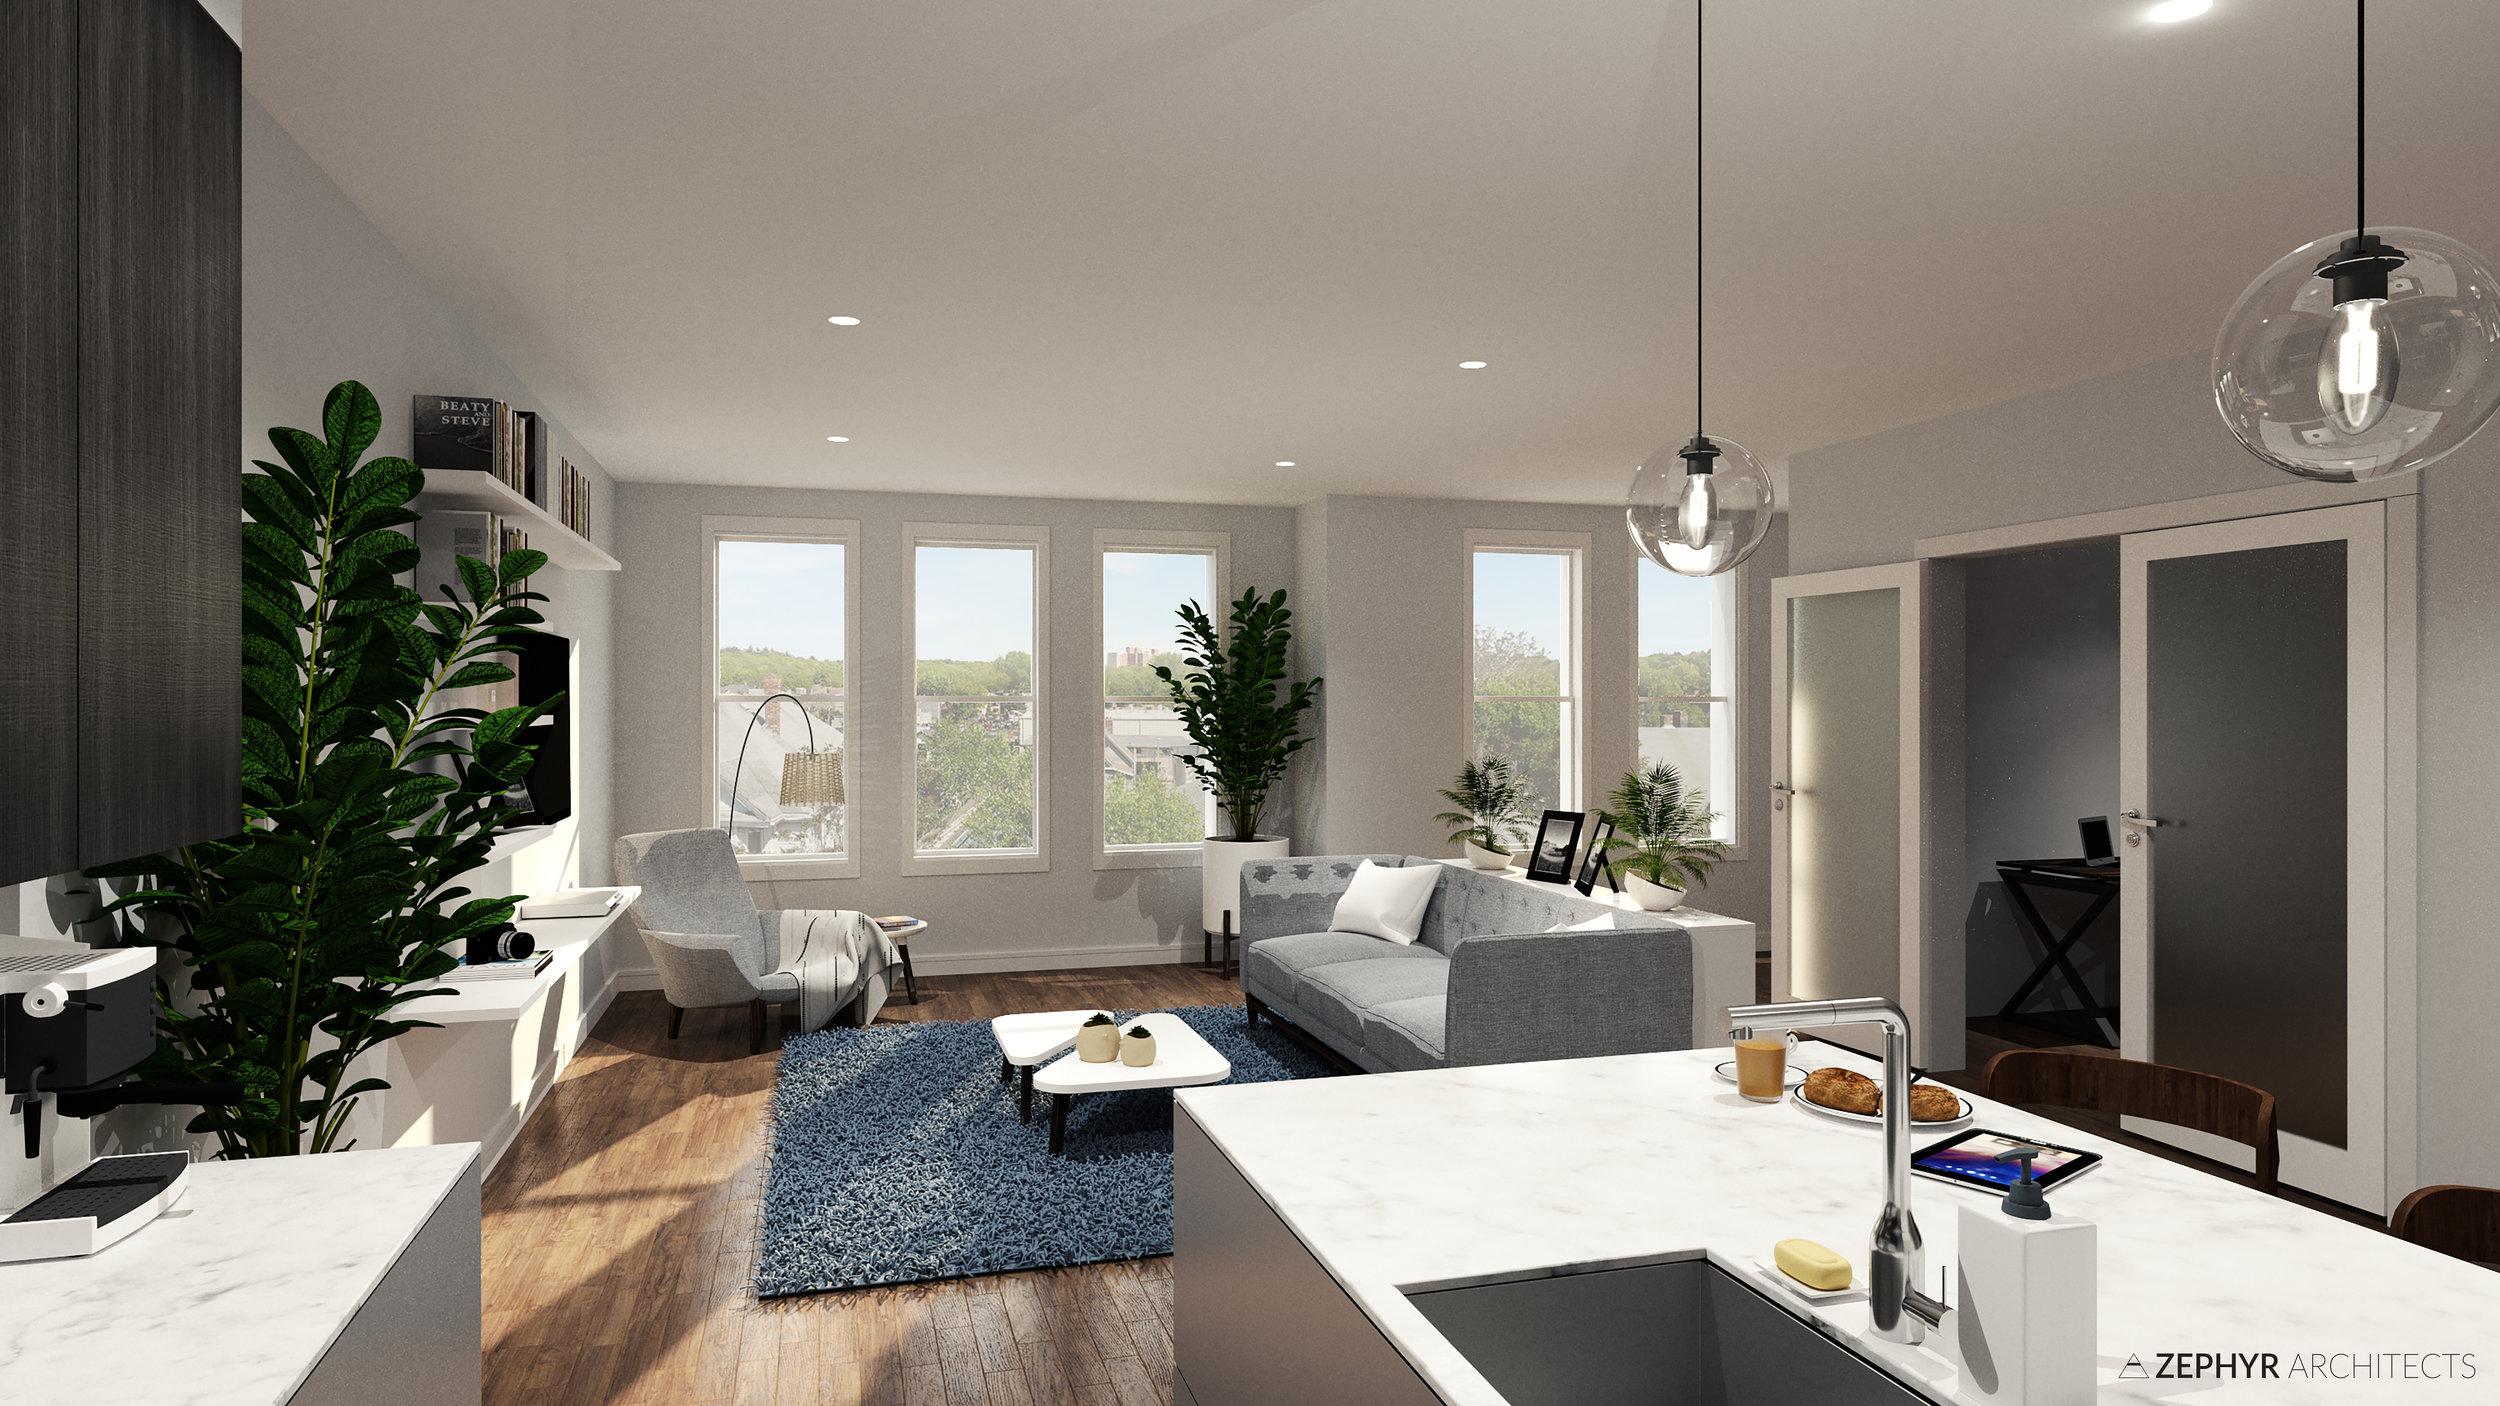 Living Room_300dpi_190129.jpg